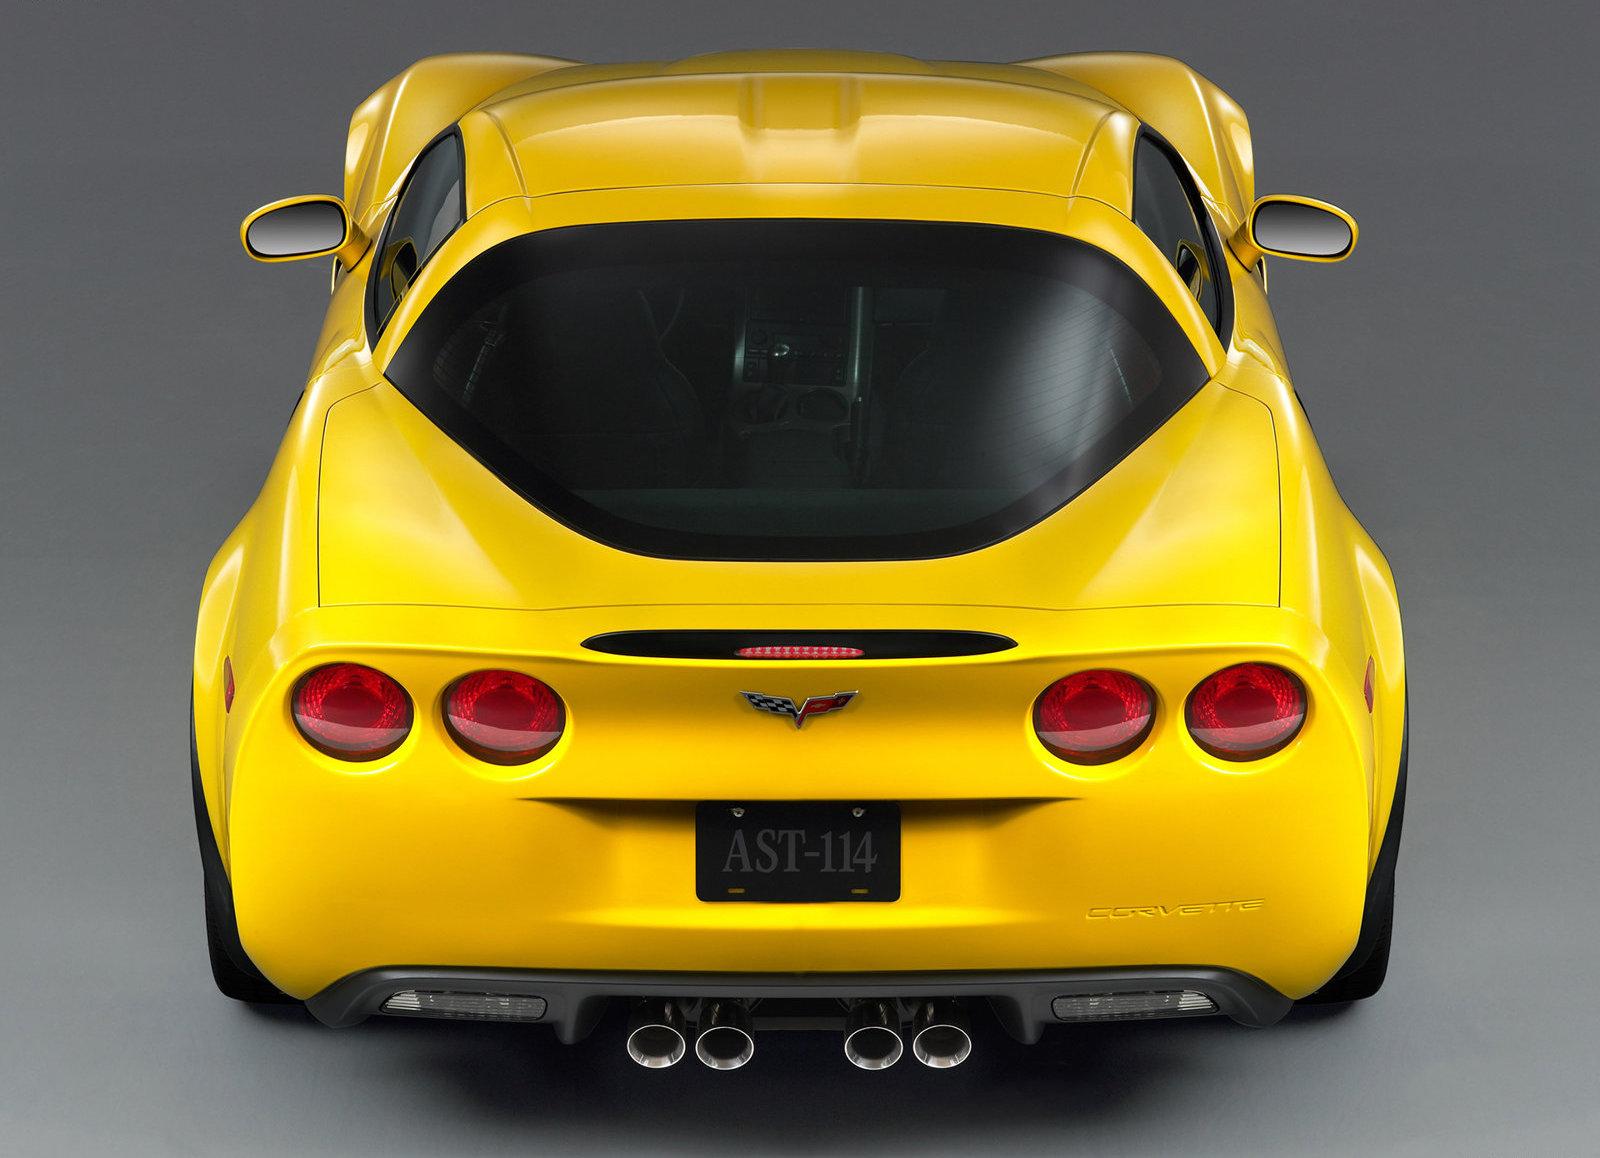 2006 Chevrolet Corvette Z06 rear haunches